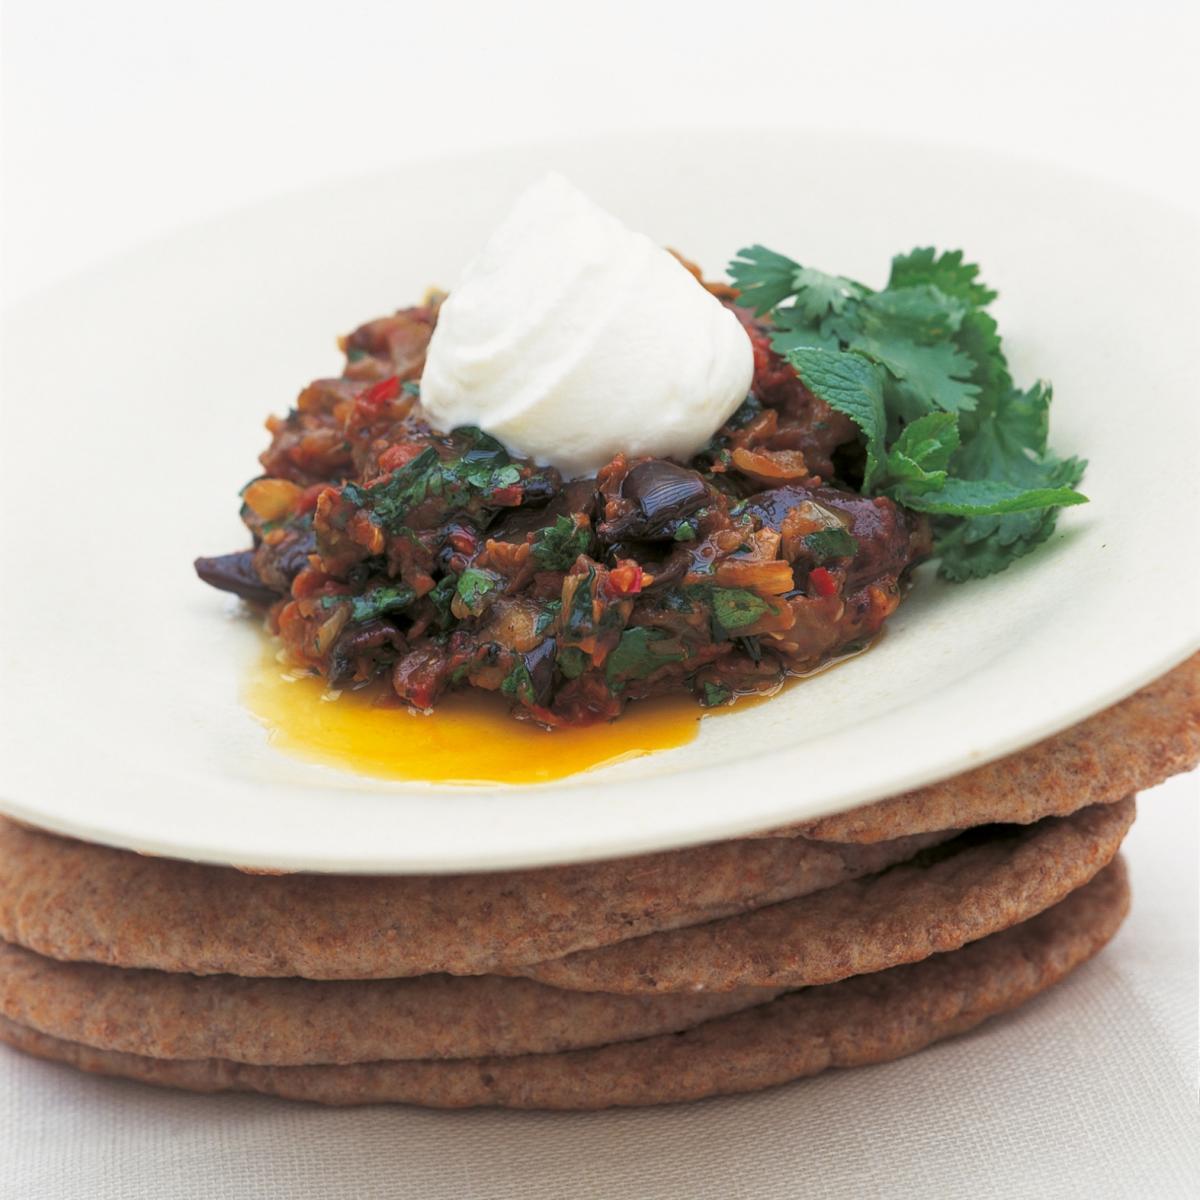 A picture of Delia's Tunisian Aubergine Salad with Coriander and Yoghurt recipe